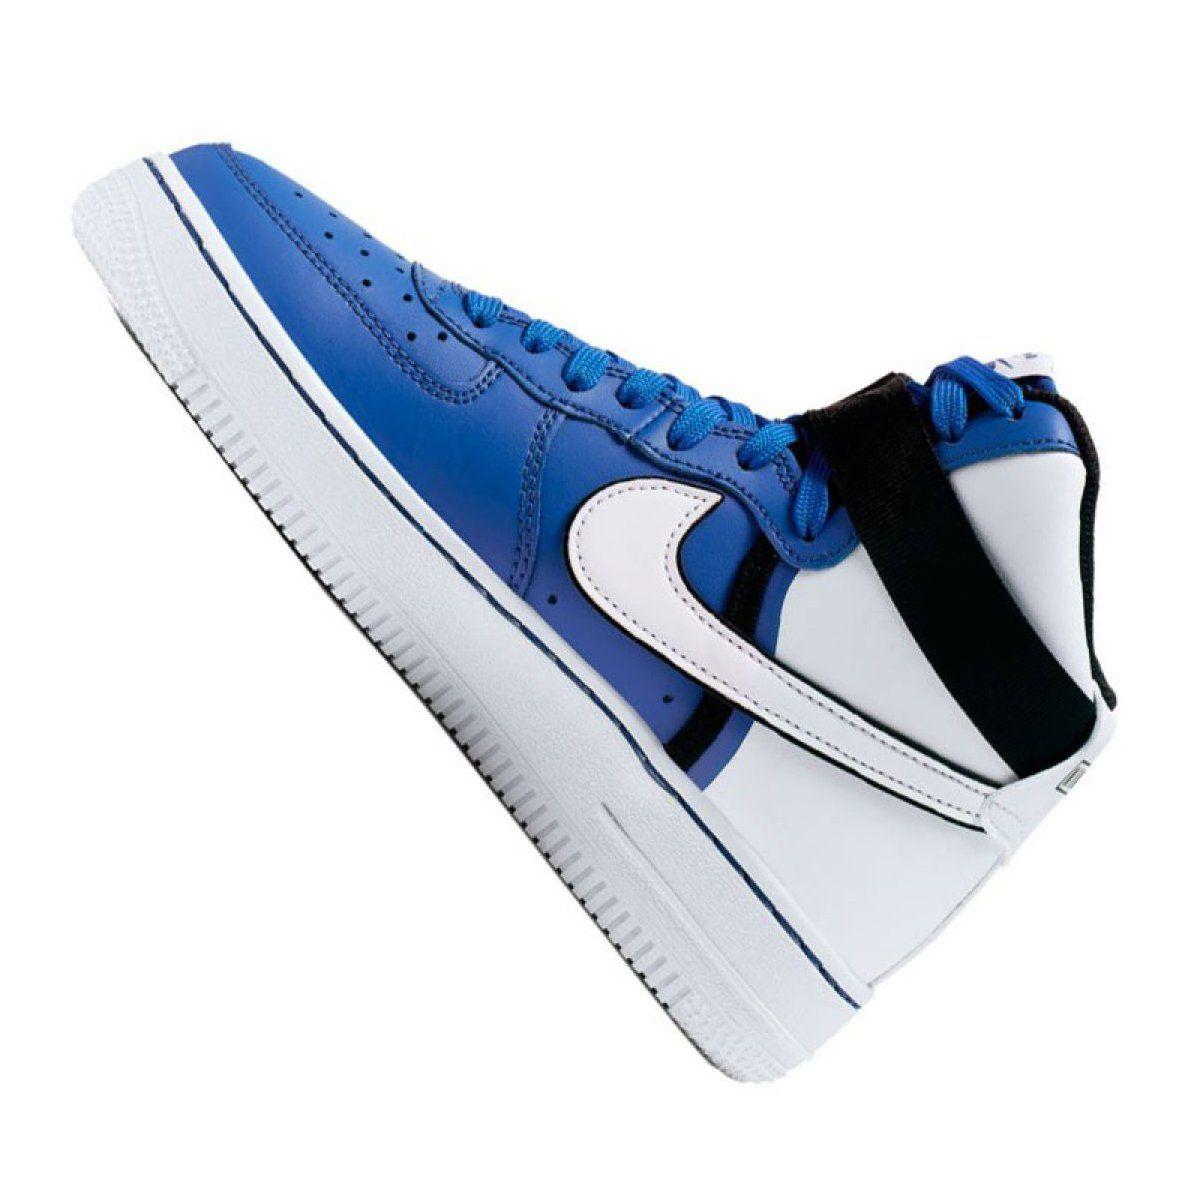 Buty Nike Air Force 1 High Lv8 2 Jr Ci2164 400 Bialo Niebieskie Biale Nike Air Nike Air Force Sneaker Nike Air Force